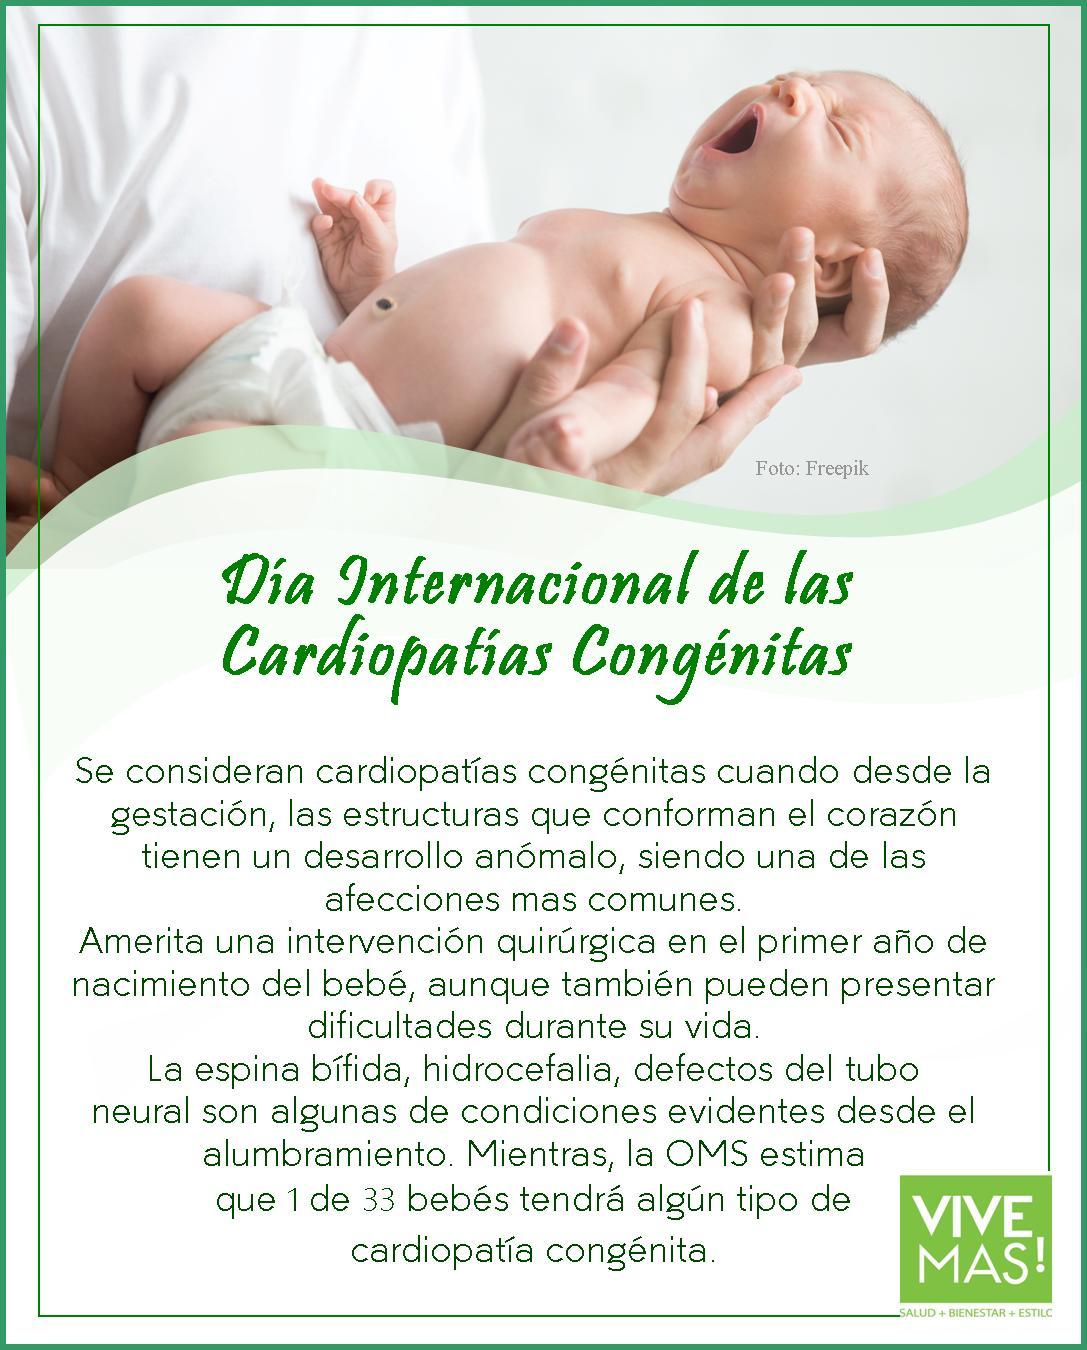 DIA-INTL-CARDIOPATIAS-CONGENITAS-14-FEBRERO-2021